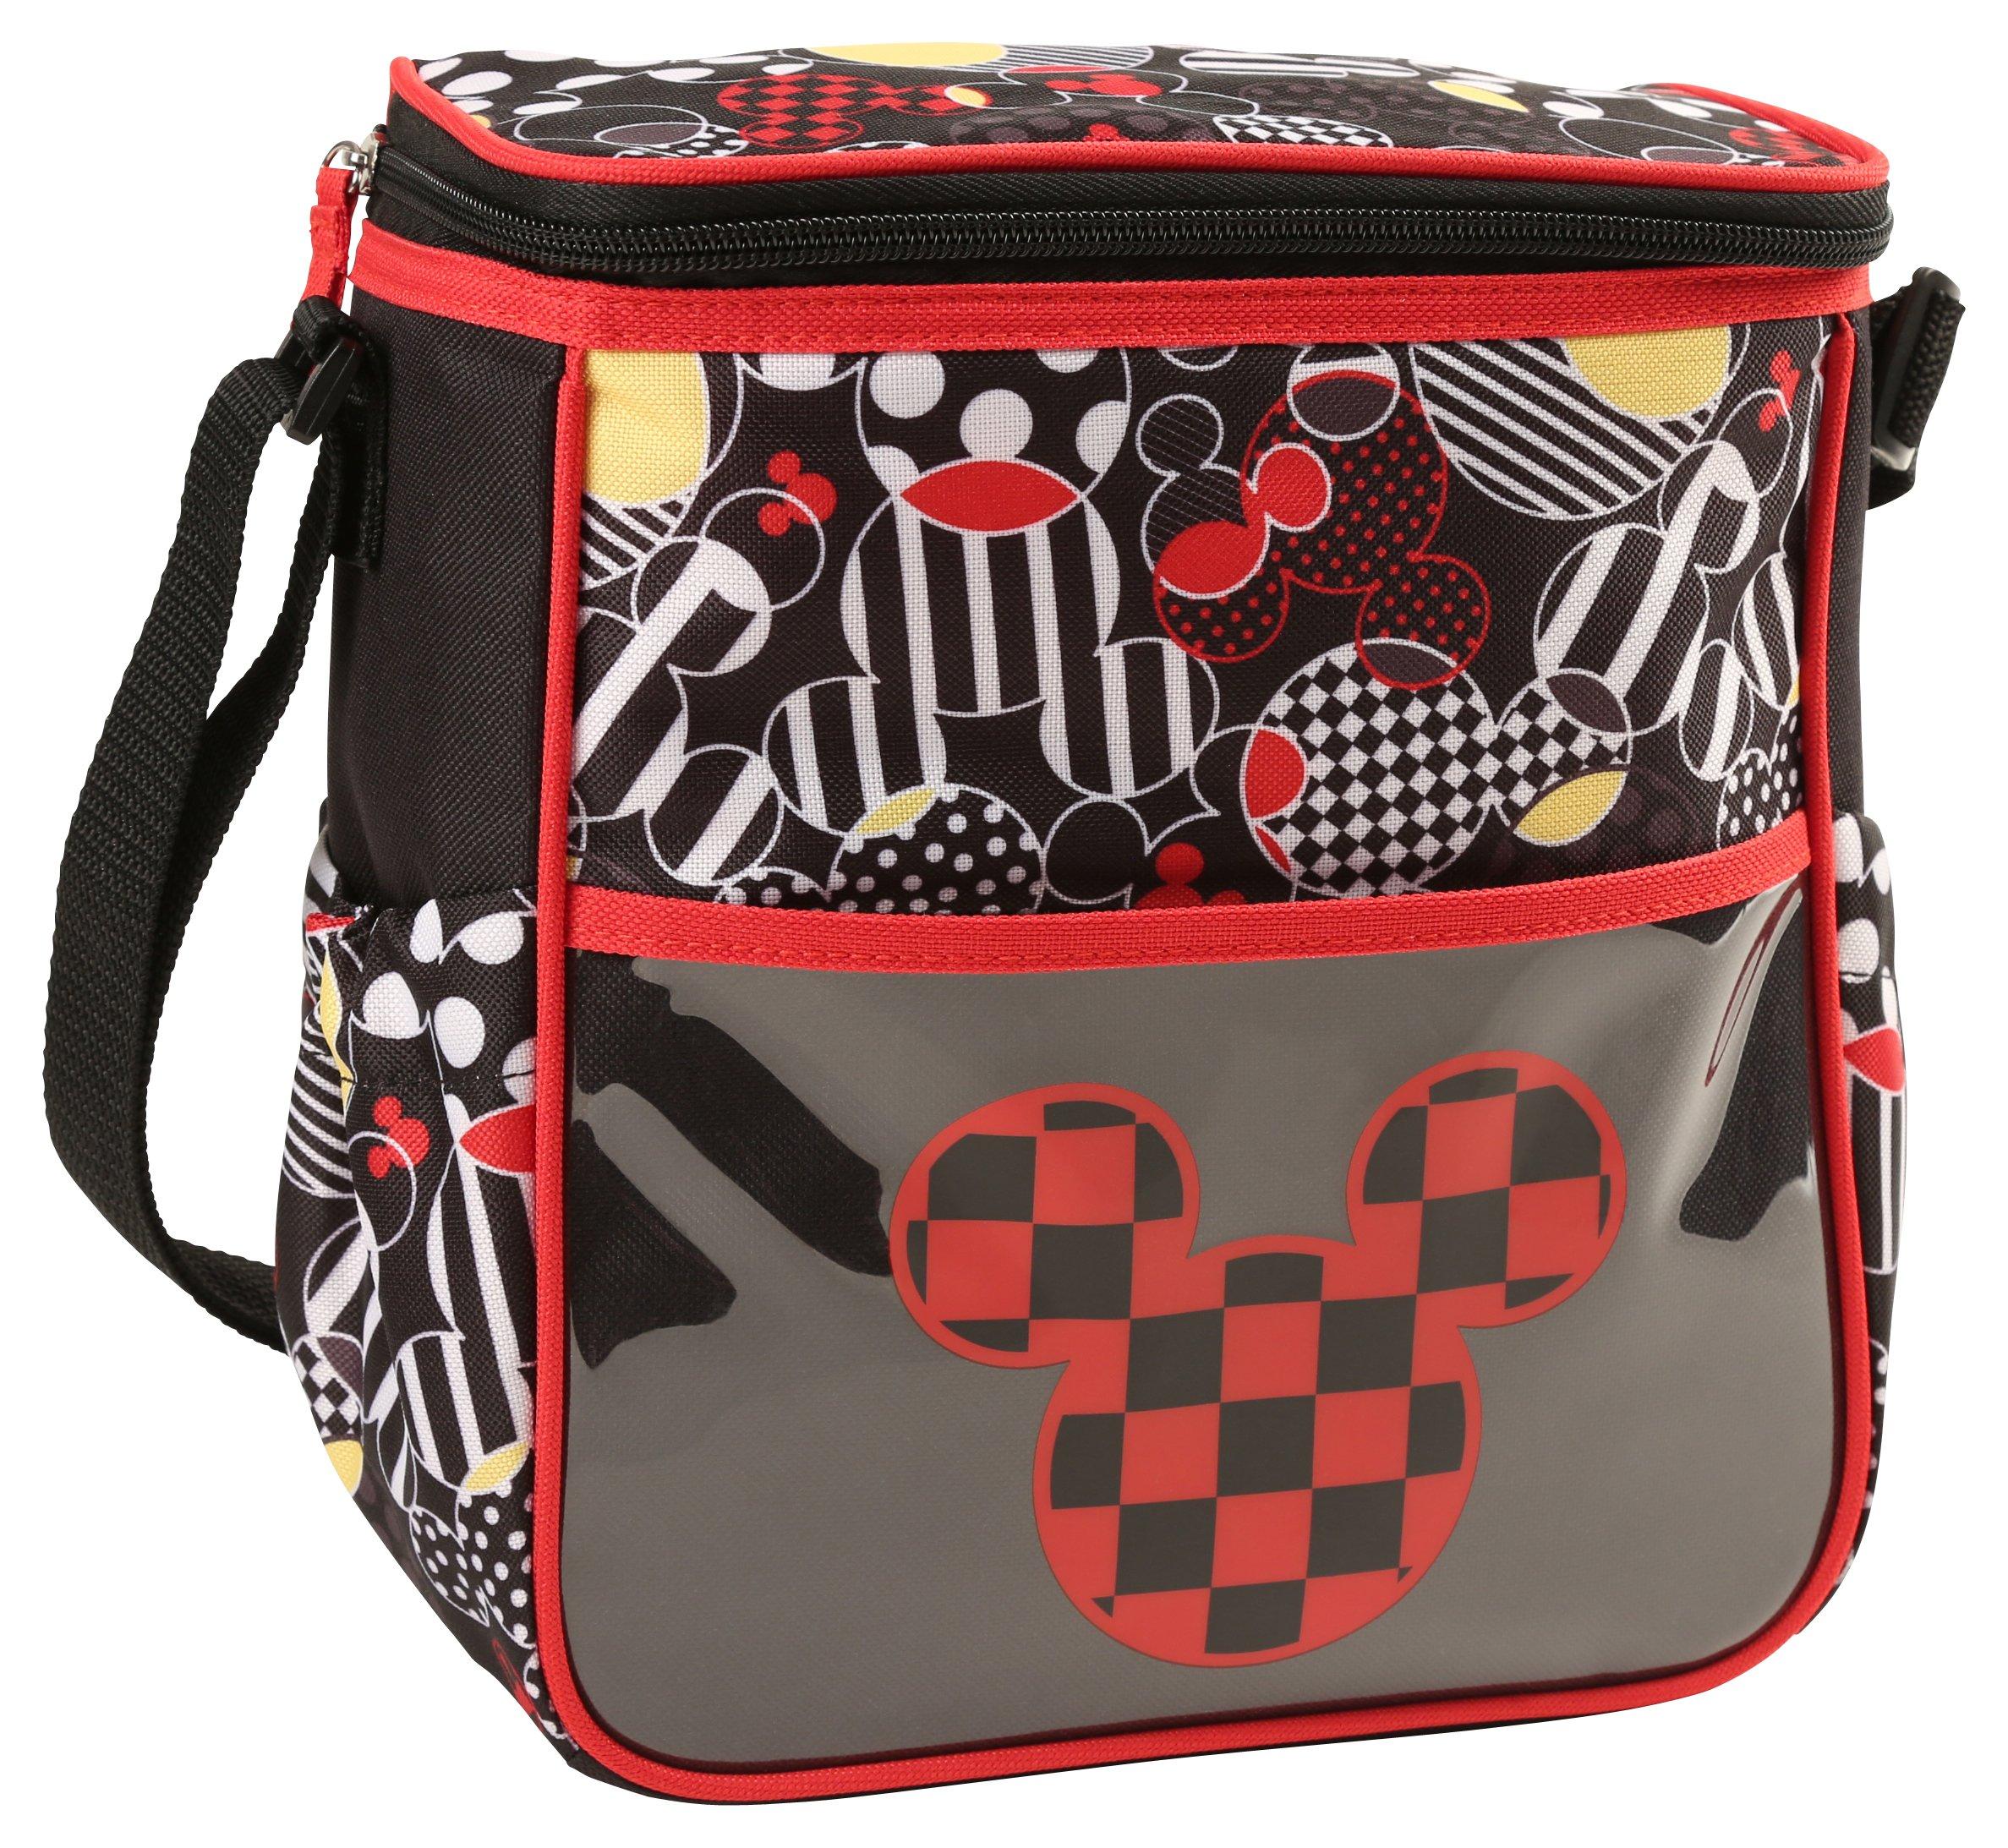 Disney Mickey Mouse Mini Diaper Bag, Toss Heads II